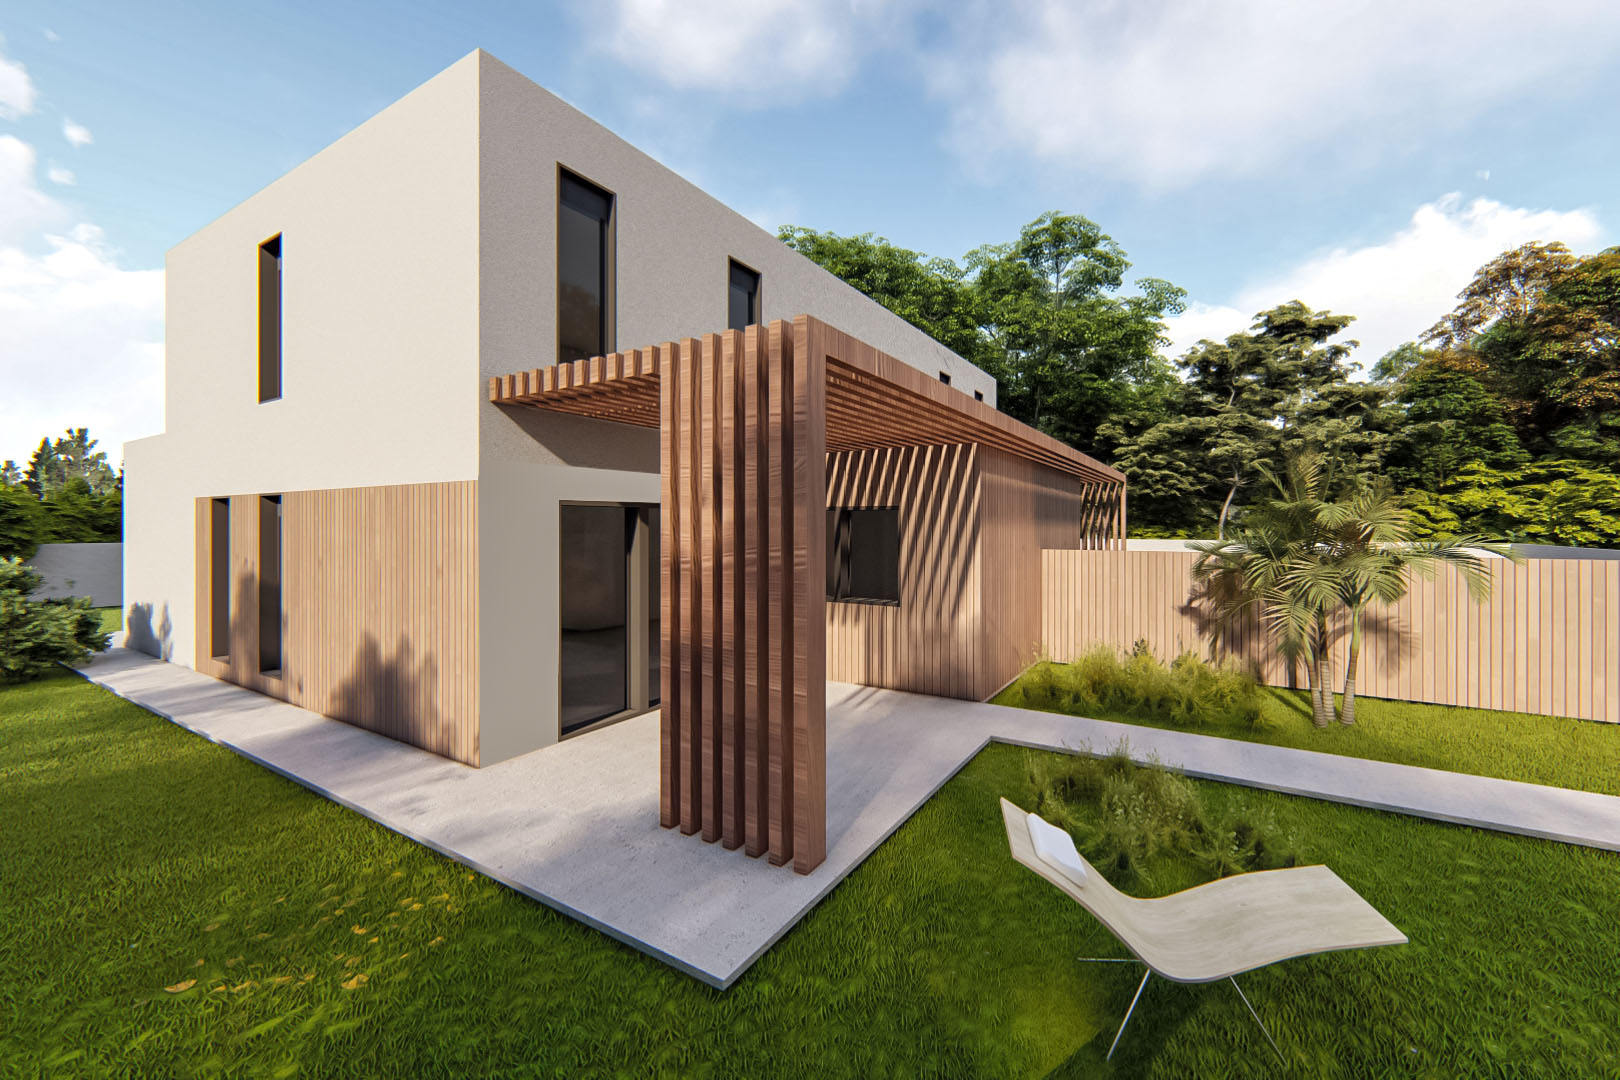 Proyectos Arquima - Casa Torrent